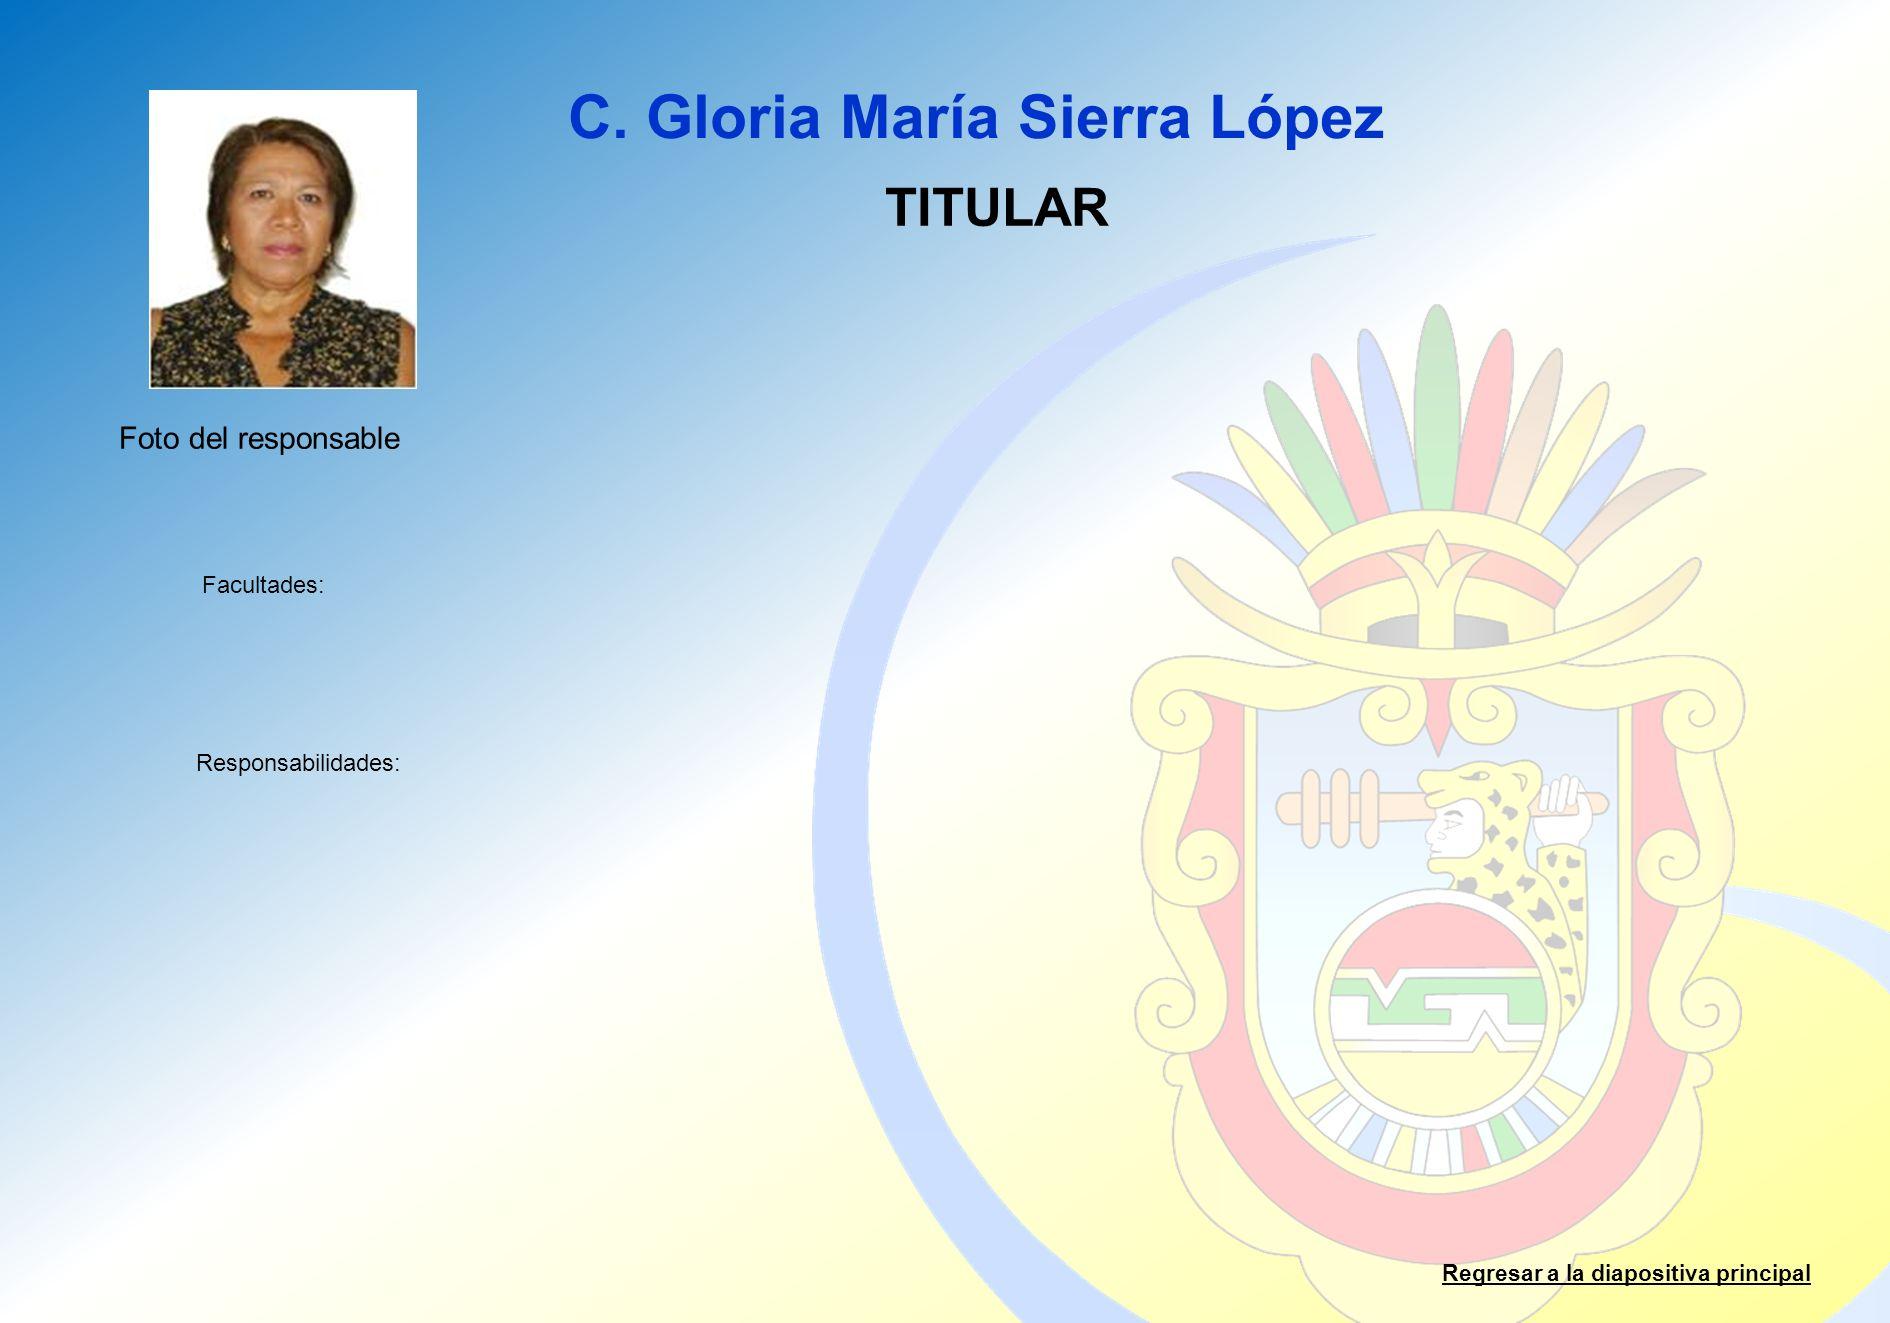 C. Gloria María Sierra López Facultades: Responsabilidades: Regresar a la diapositiva principal TITULAR Foto del responsable